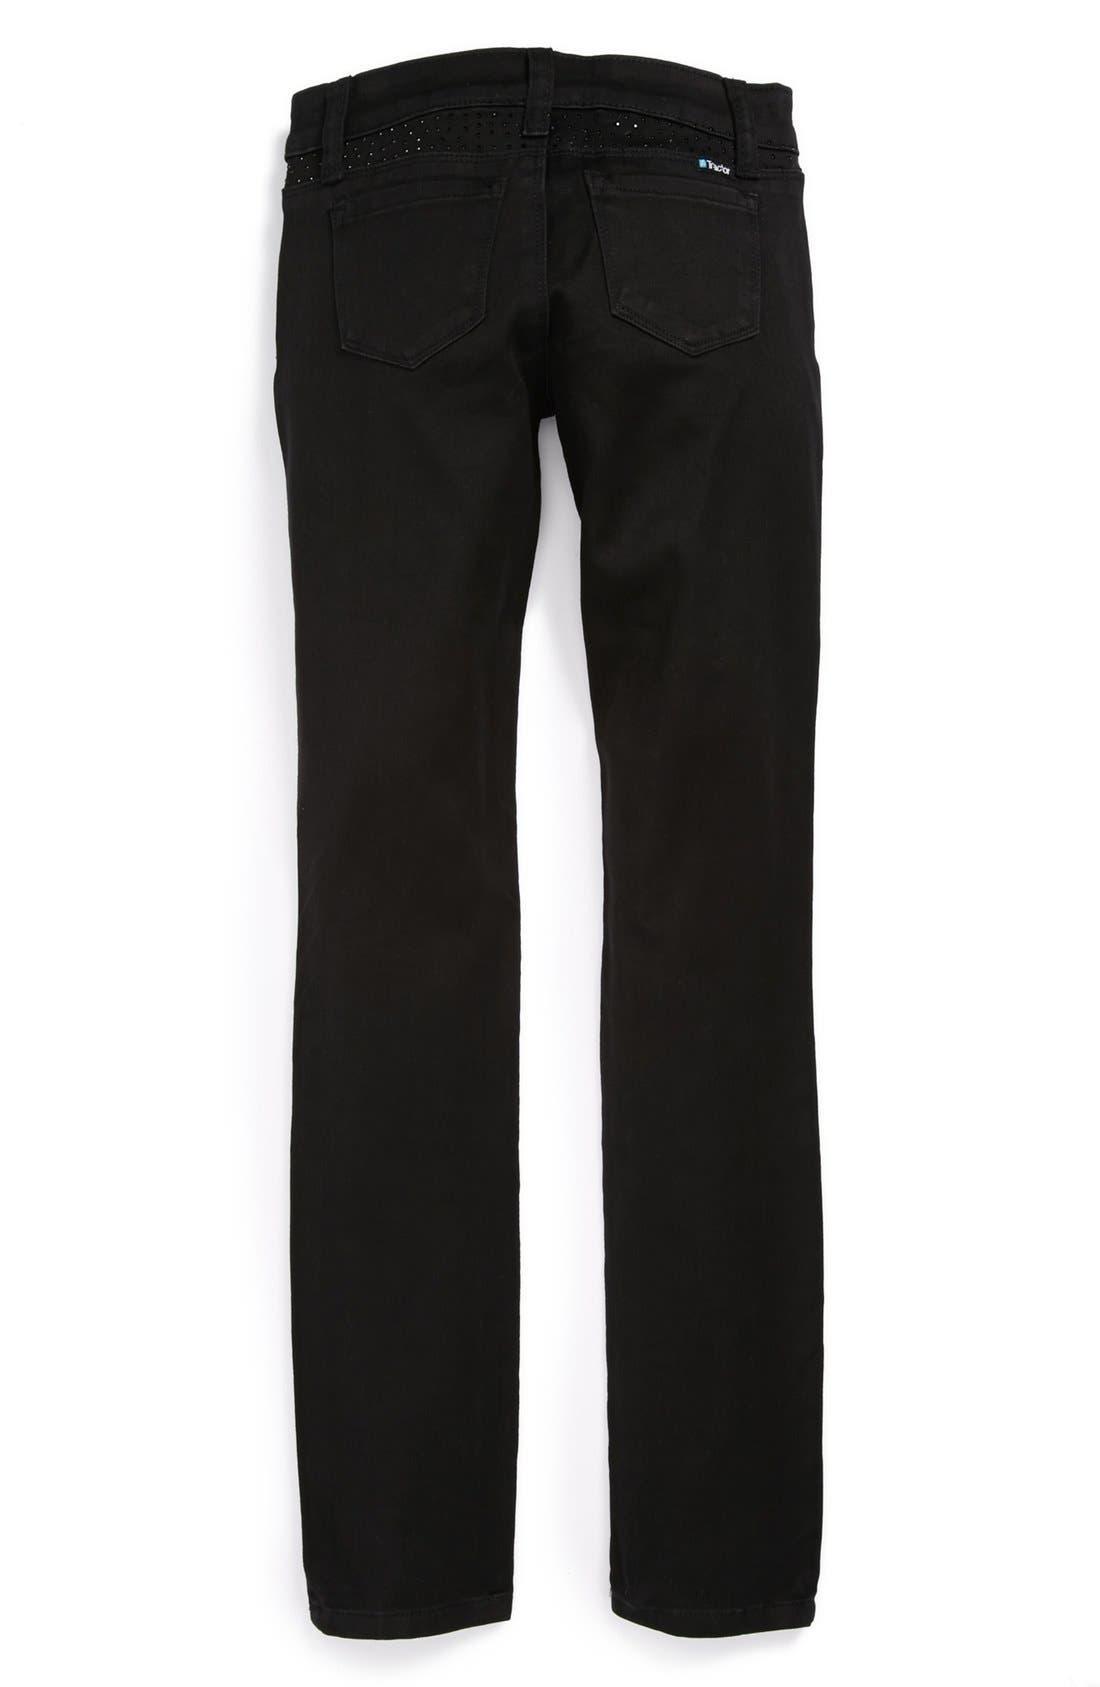 Alternate Image 2  - Tractr Sparkle Skinny Jeans (Big Girls)